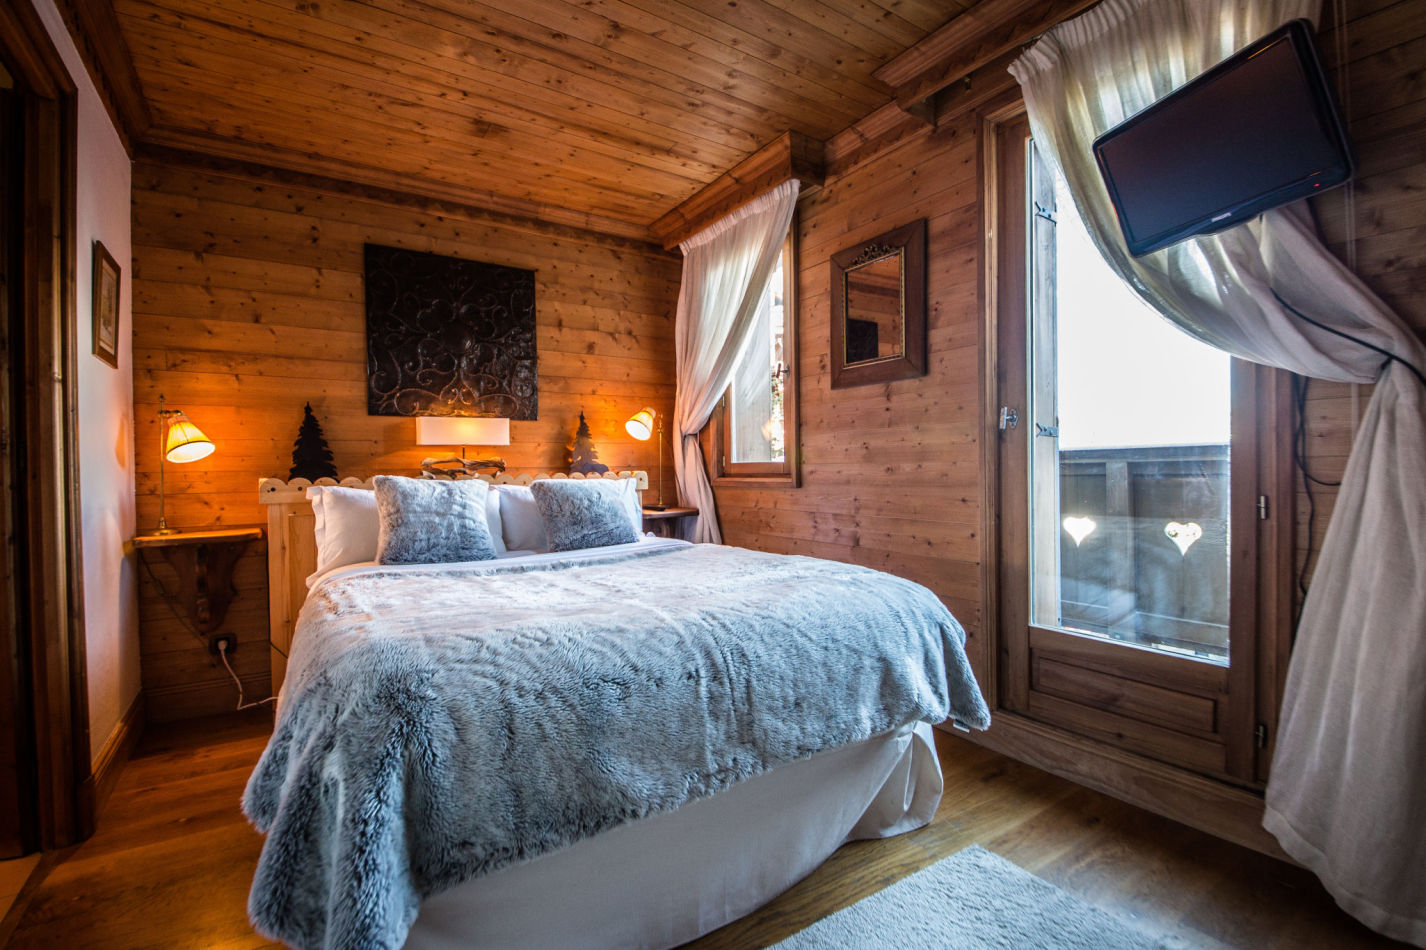 hermine-bedroom-image-1